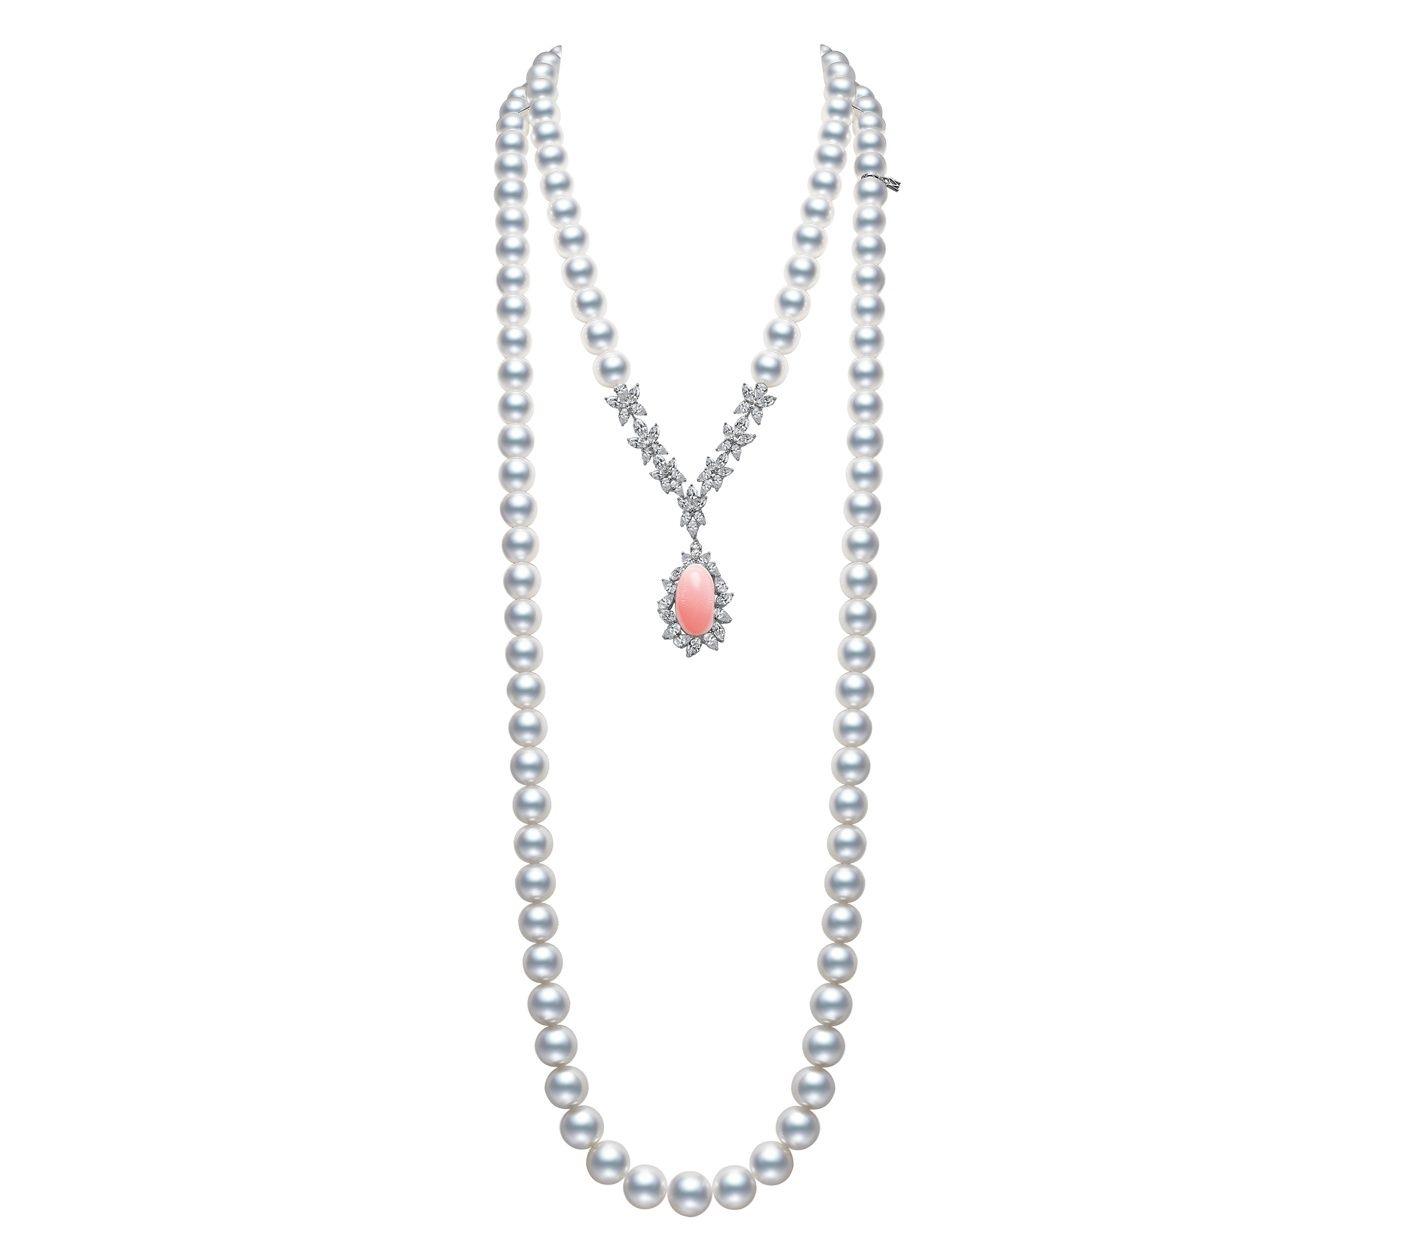 Jeux de Rubans 頂級珠寶系列,孔克珍珠蝴蝶結造型胸針,參考價格 NT$2,900,000